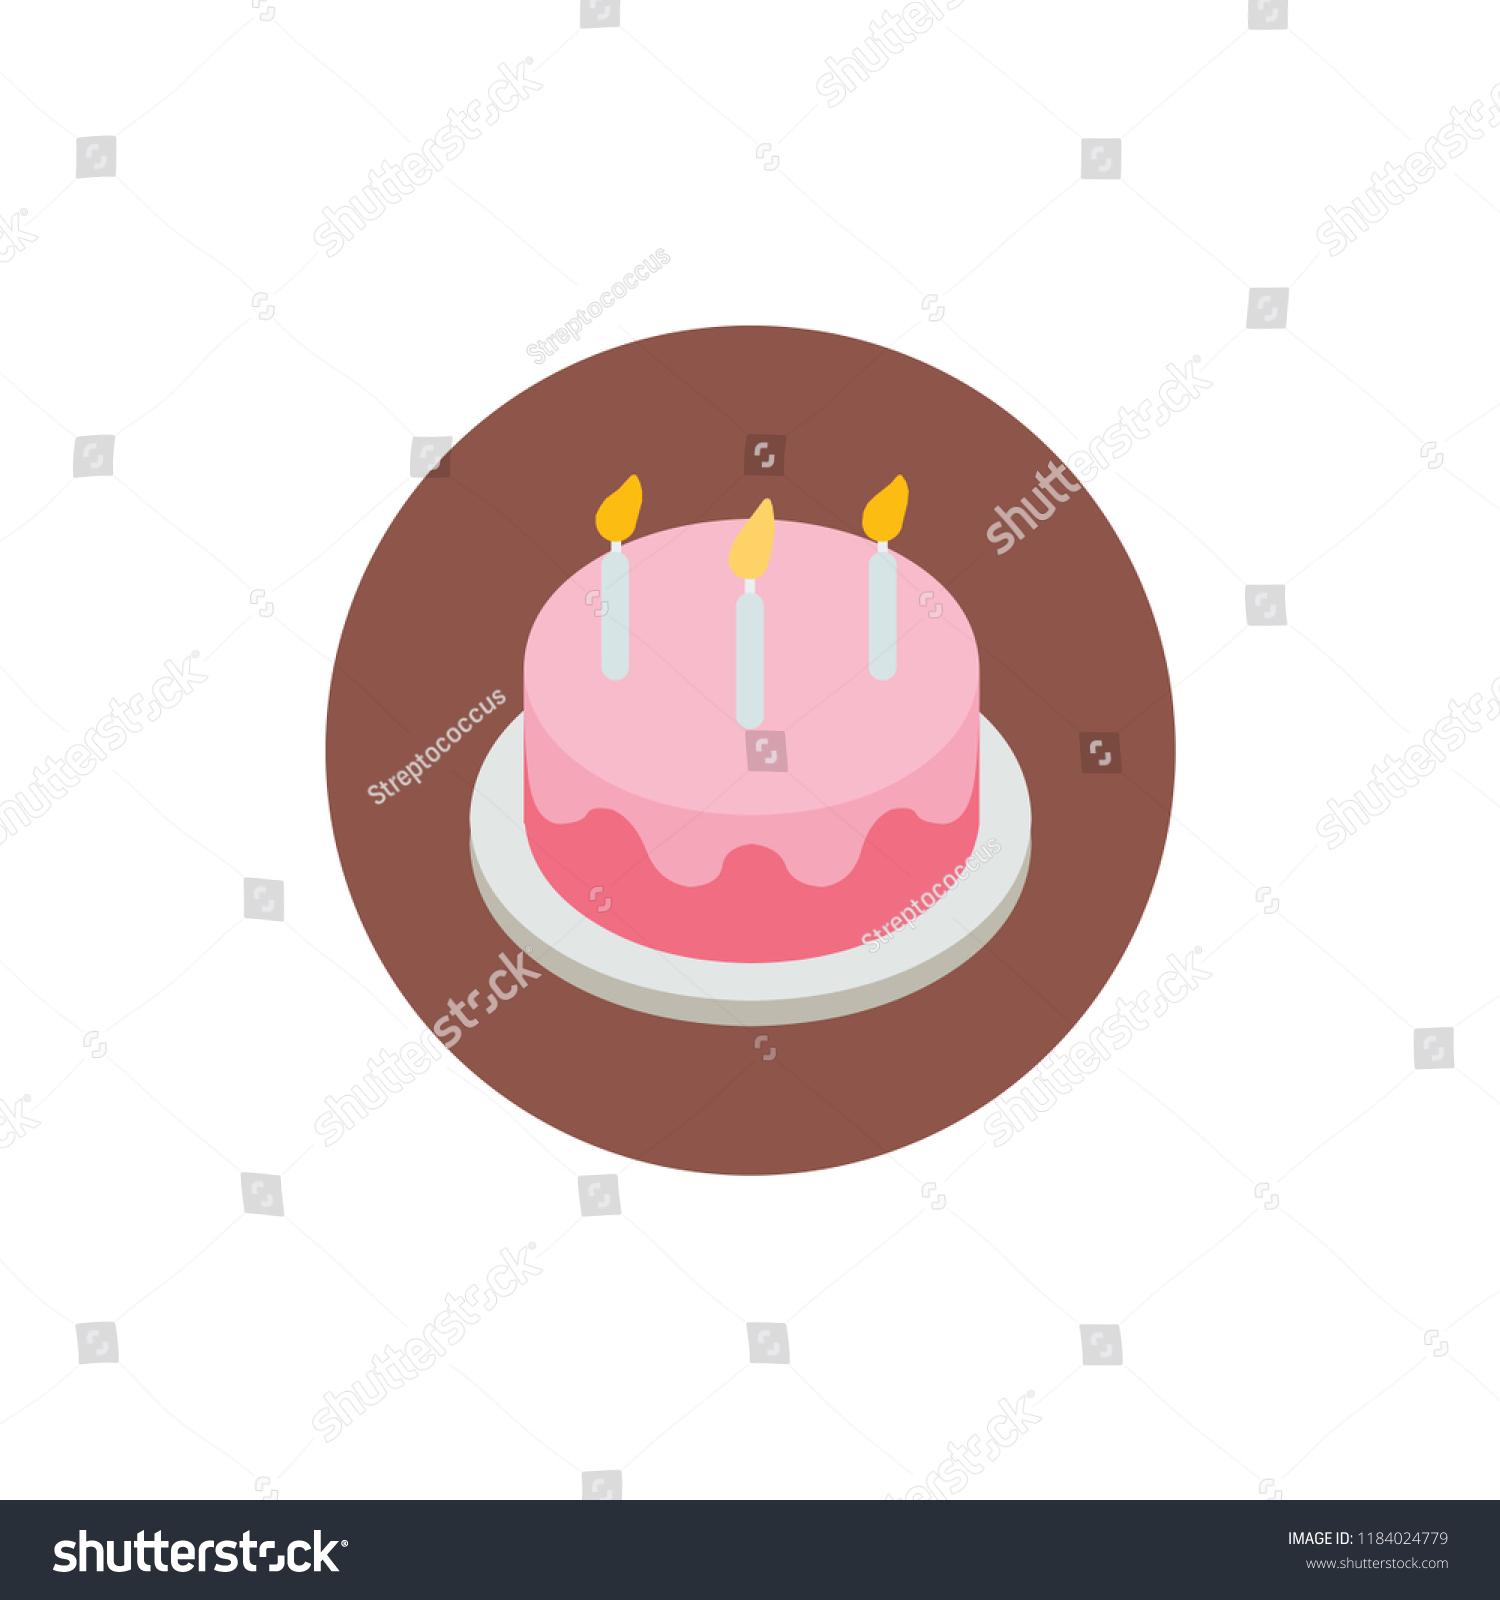 Birthday Cake Homemade Sweet Dish Food Kids Dessert Bakery Vector Illustration Flat Icon Symbol Emoji Emoticon